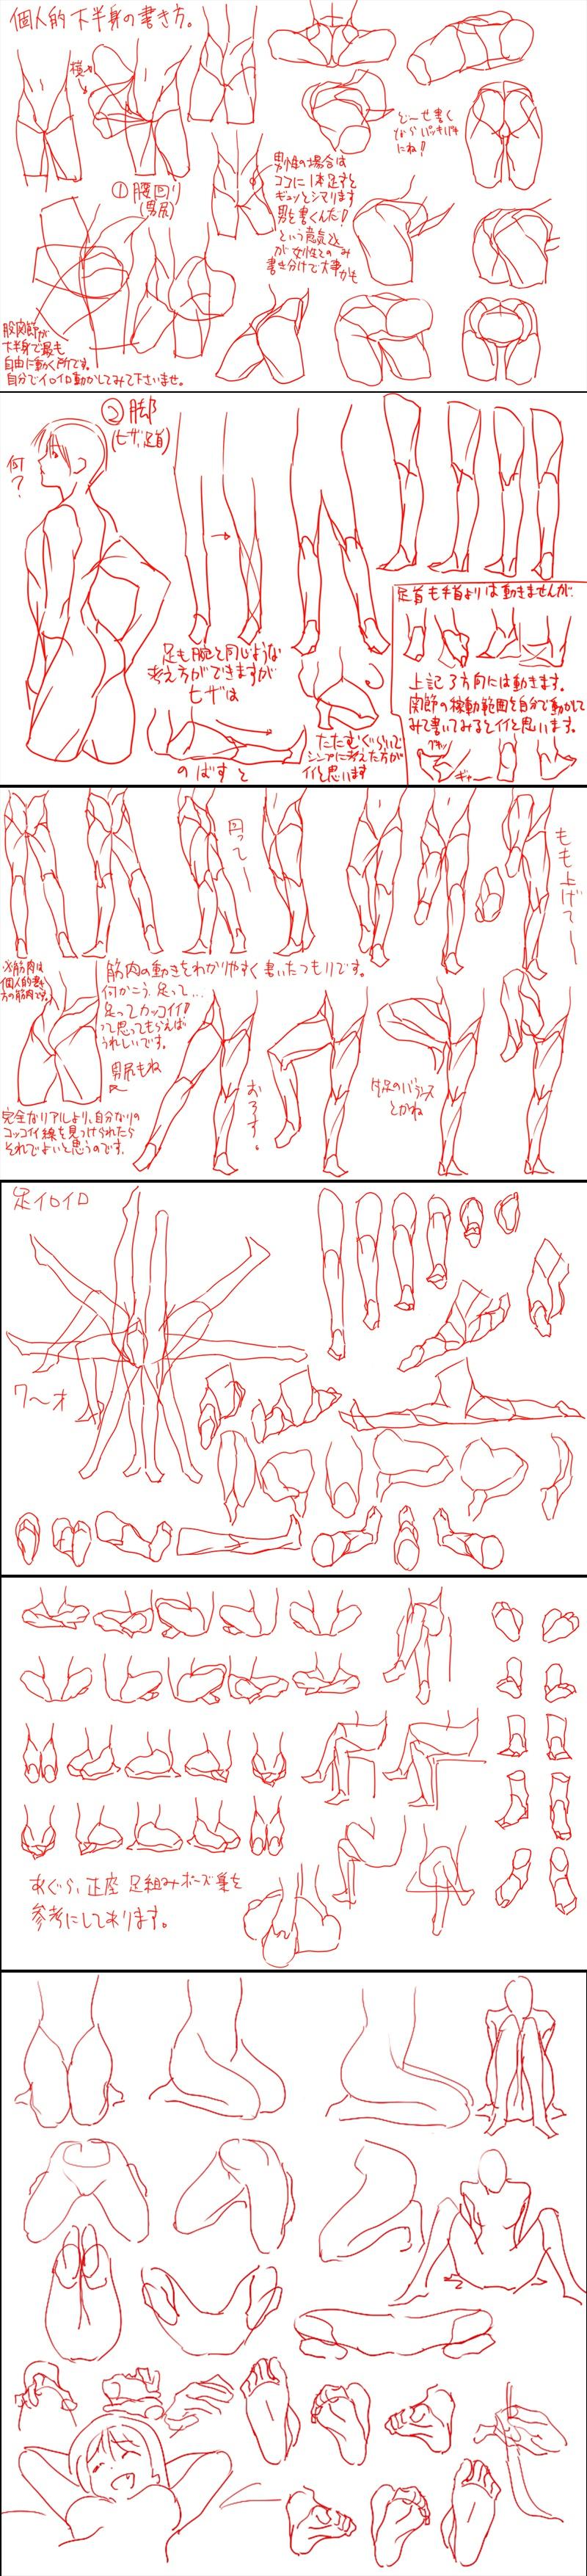 XiaoK56的微博_微博 | anime training | Pinterest | Anatomy, Draw and ...